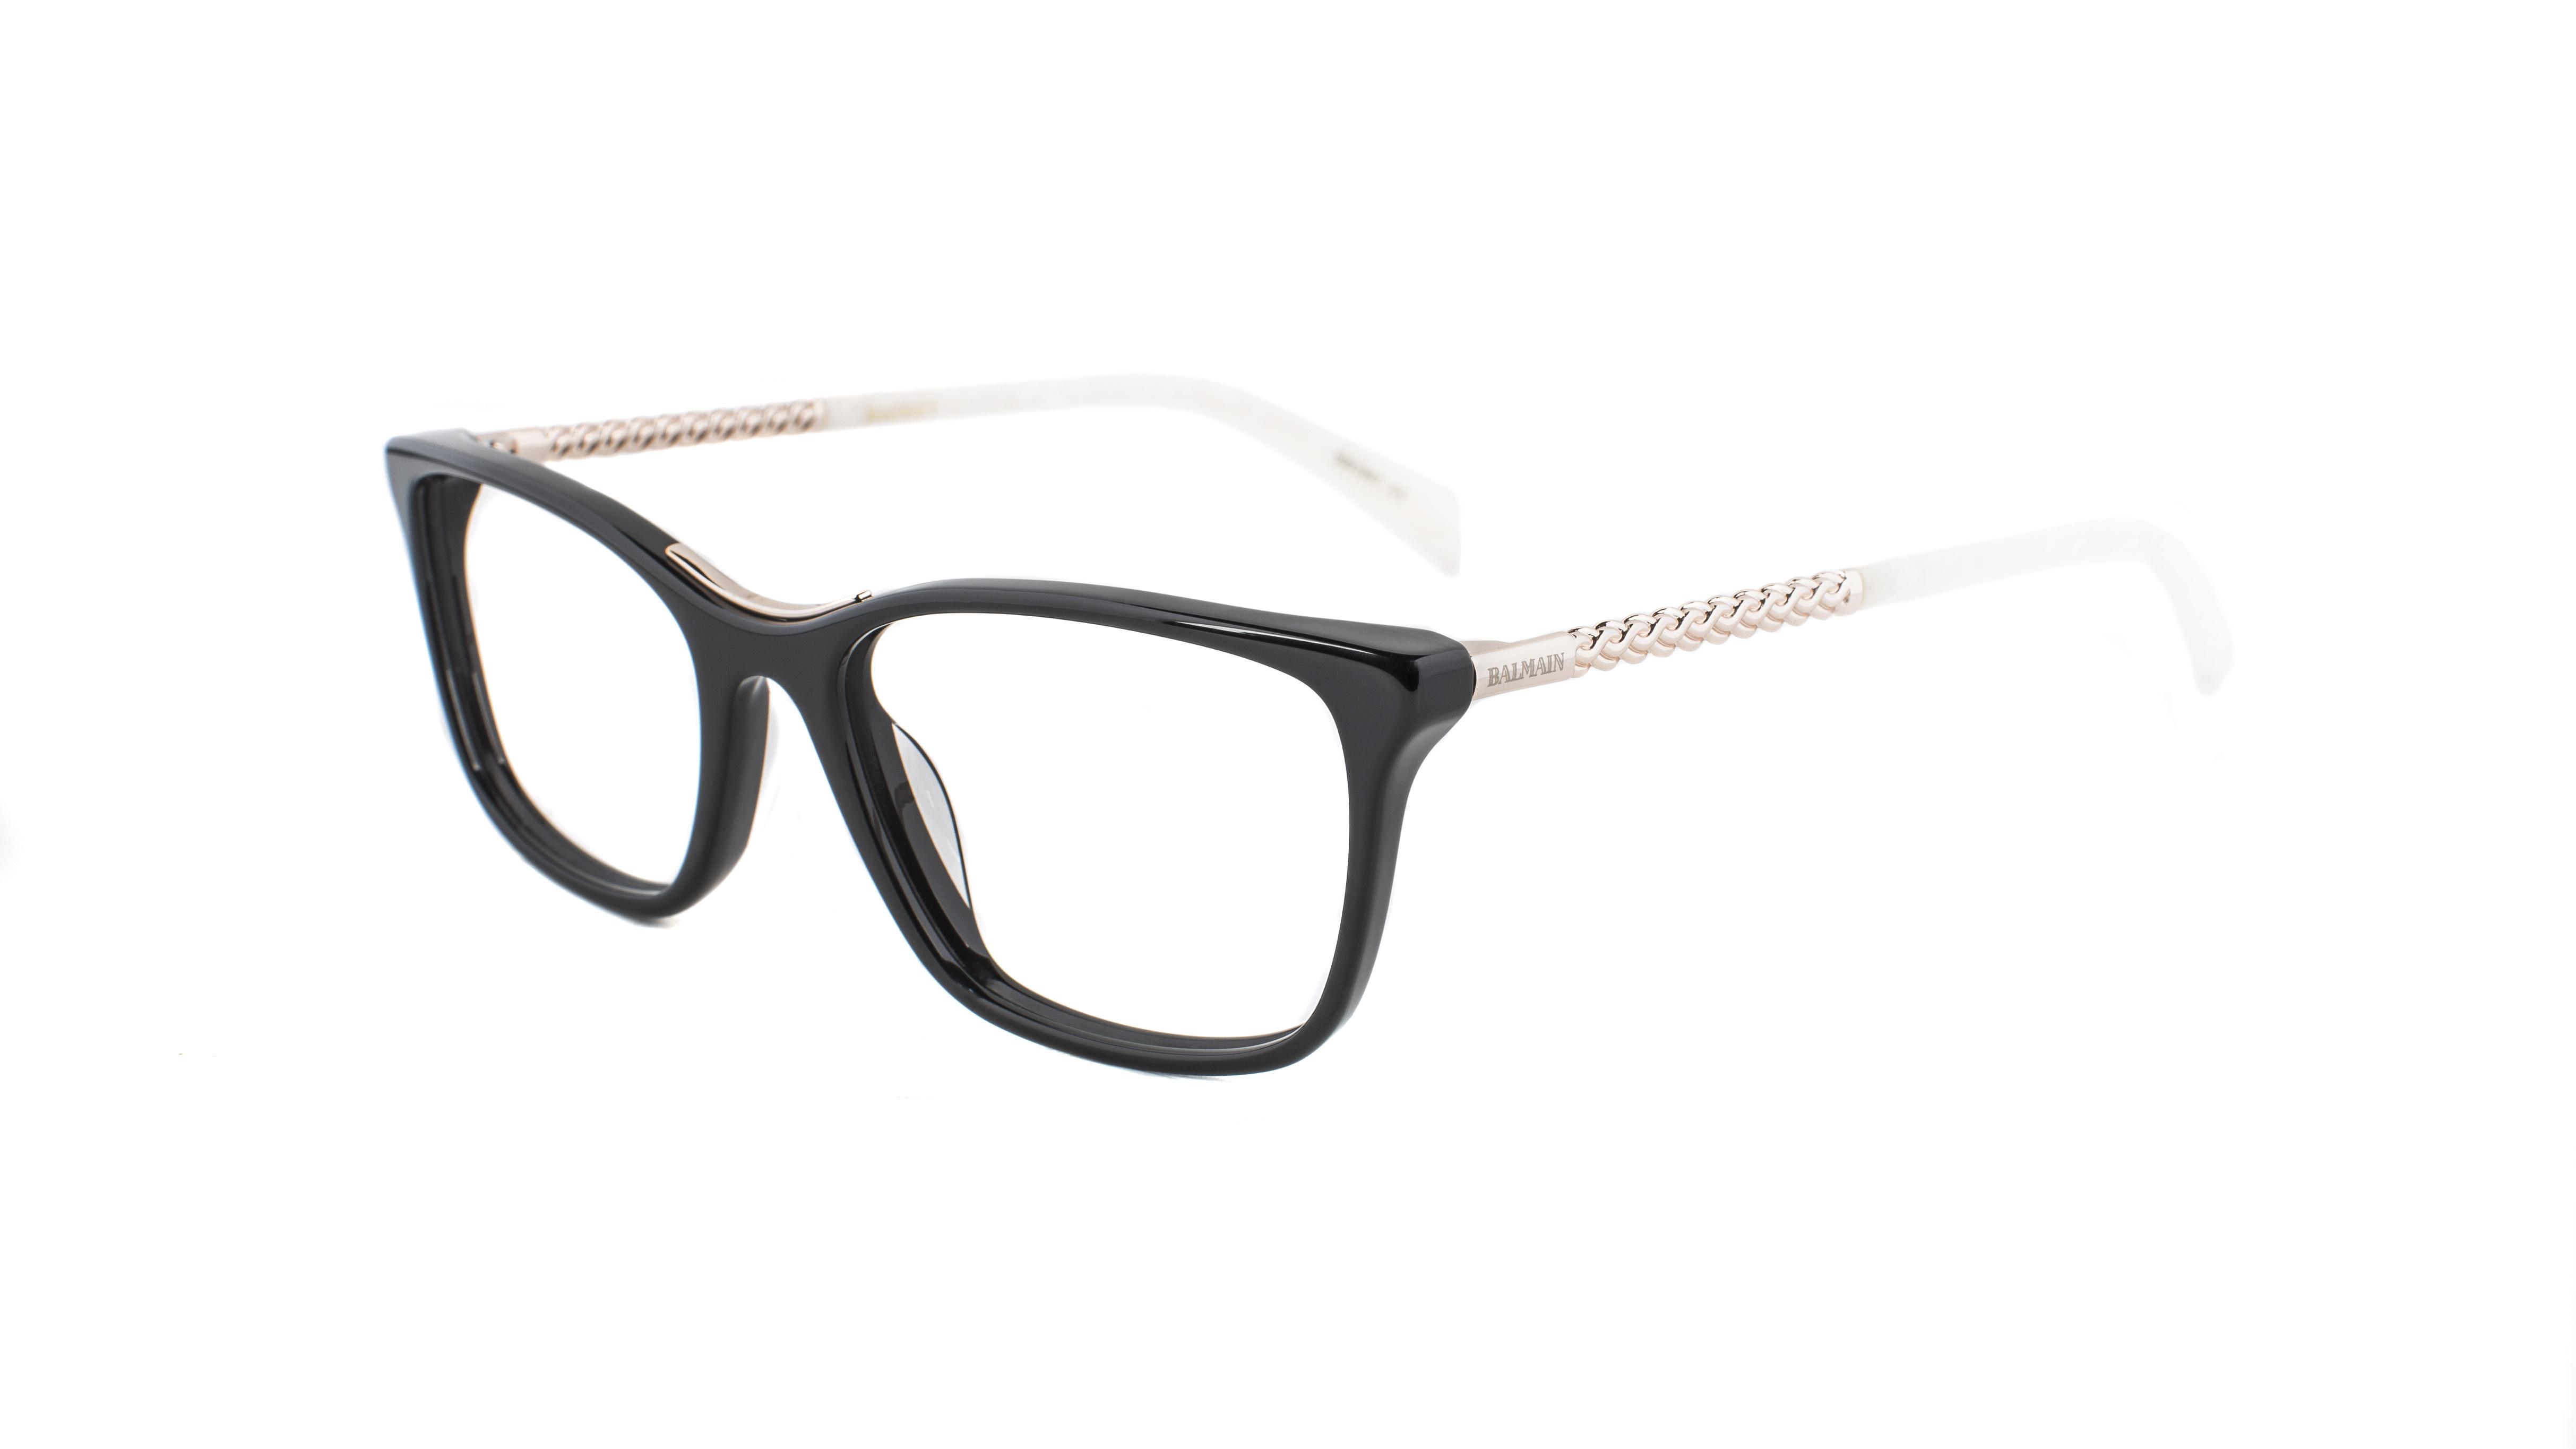 Balmain x Specsavers BL1516S 30570733 - RRP 2 pairs single vision $459